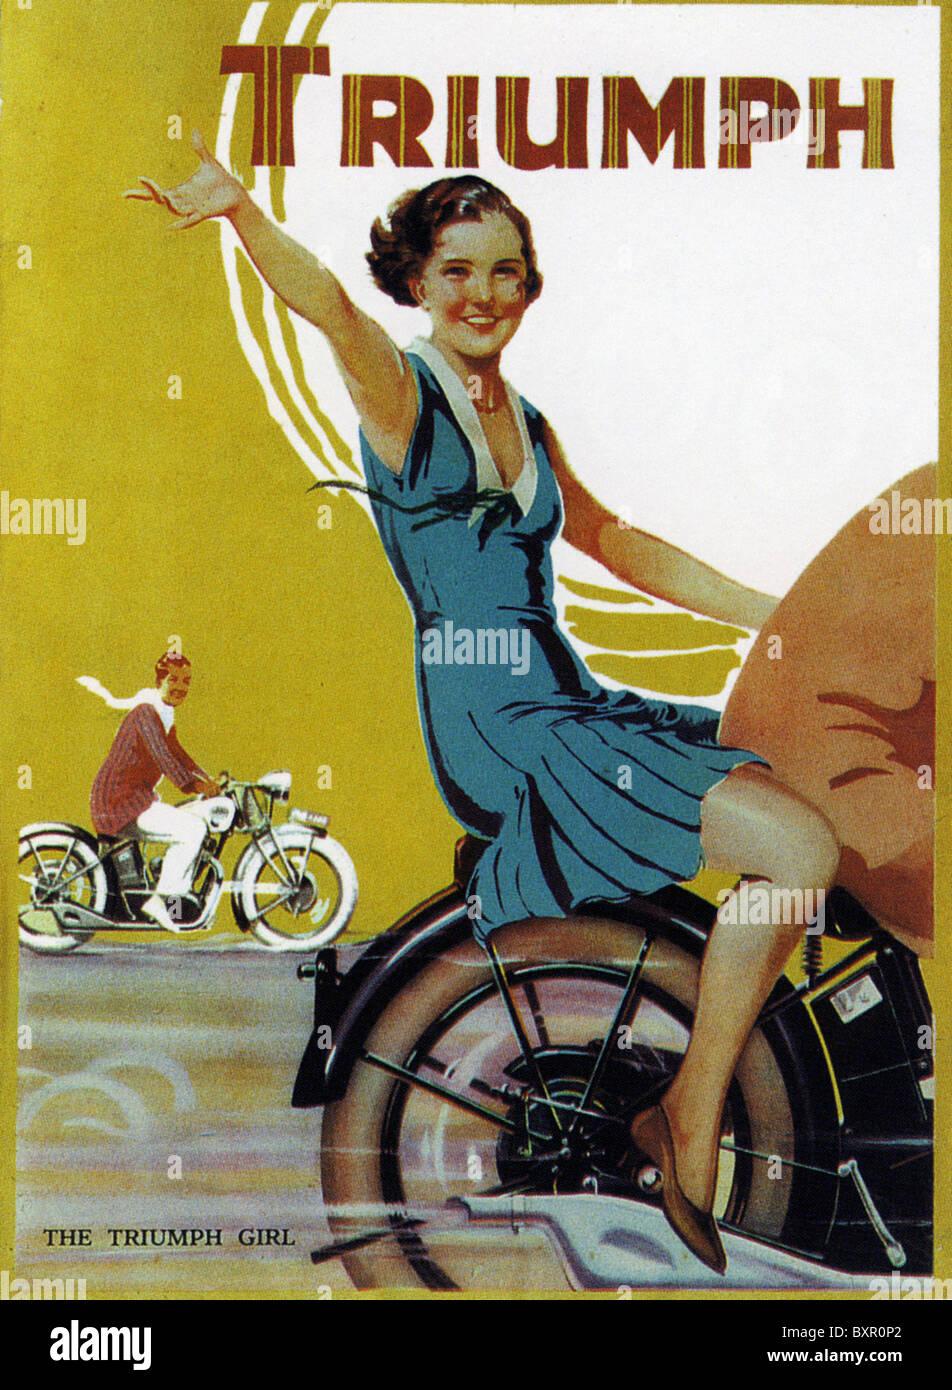 Anuncio de motocicletas Triumph 1931 Imagen De Stock